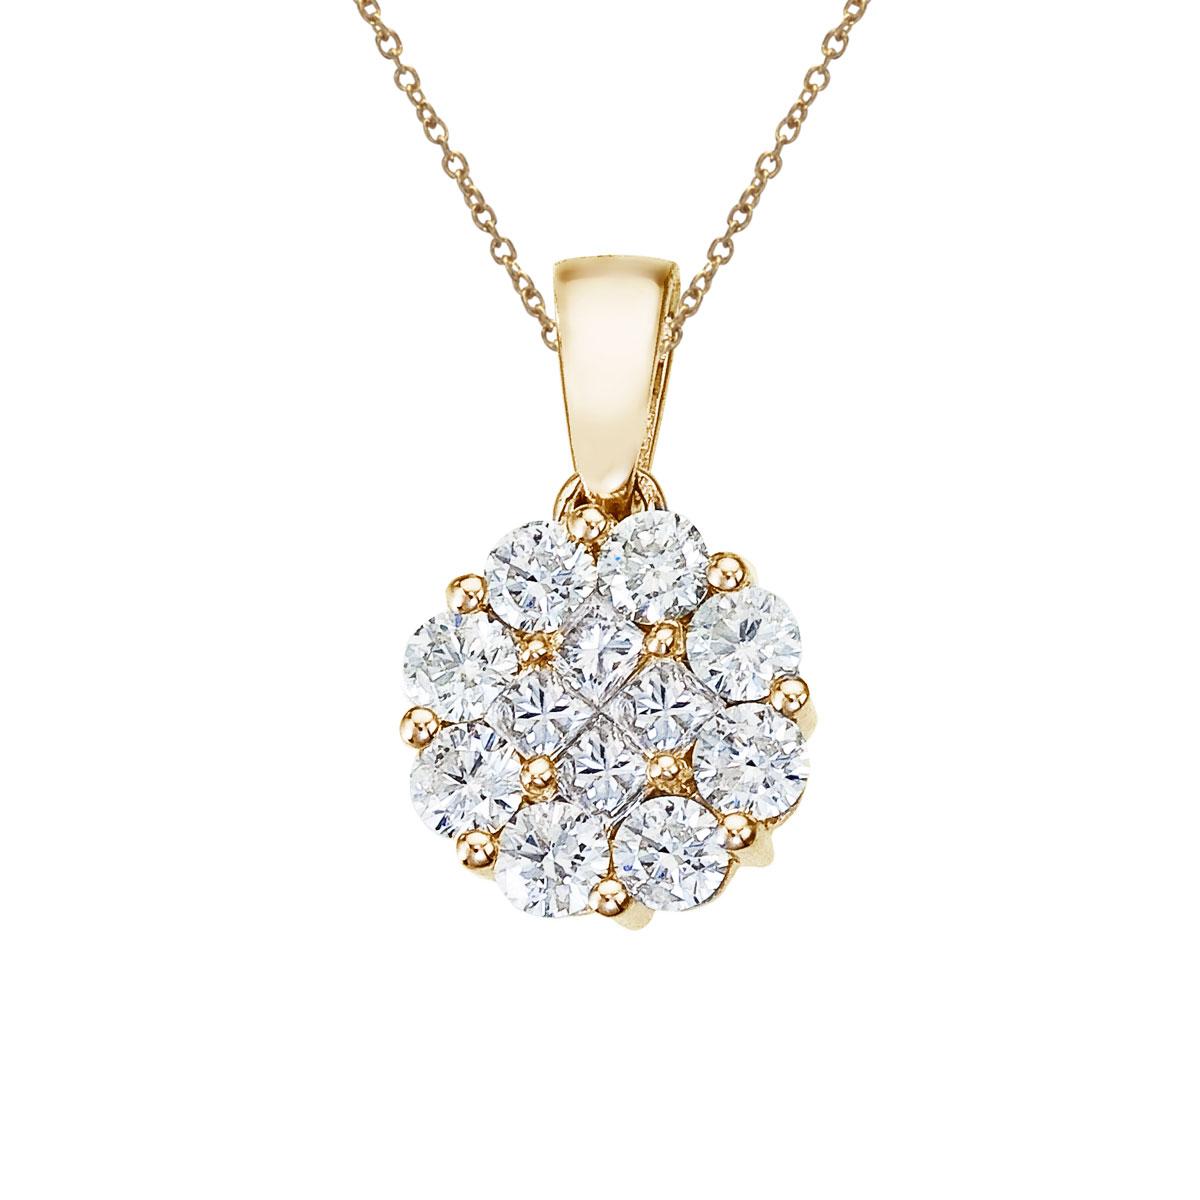 14K Yellow Gold 1 Ct Diamond Clustaire Pendant